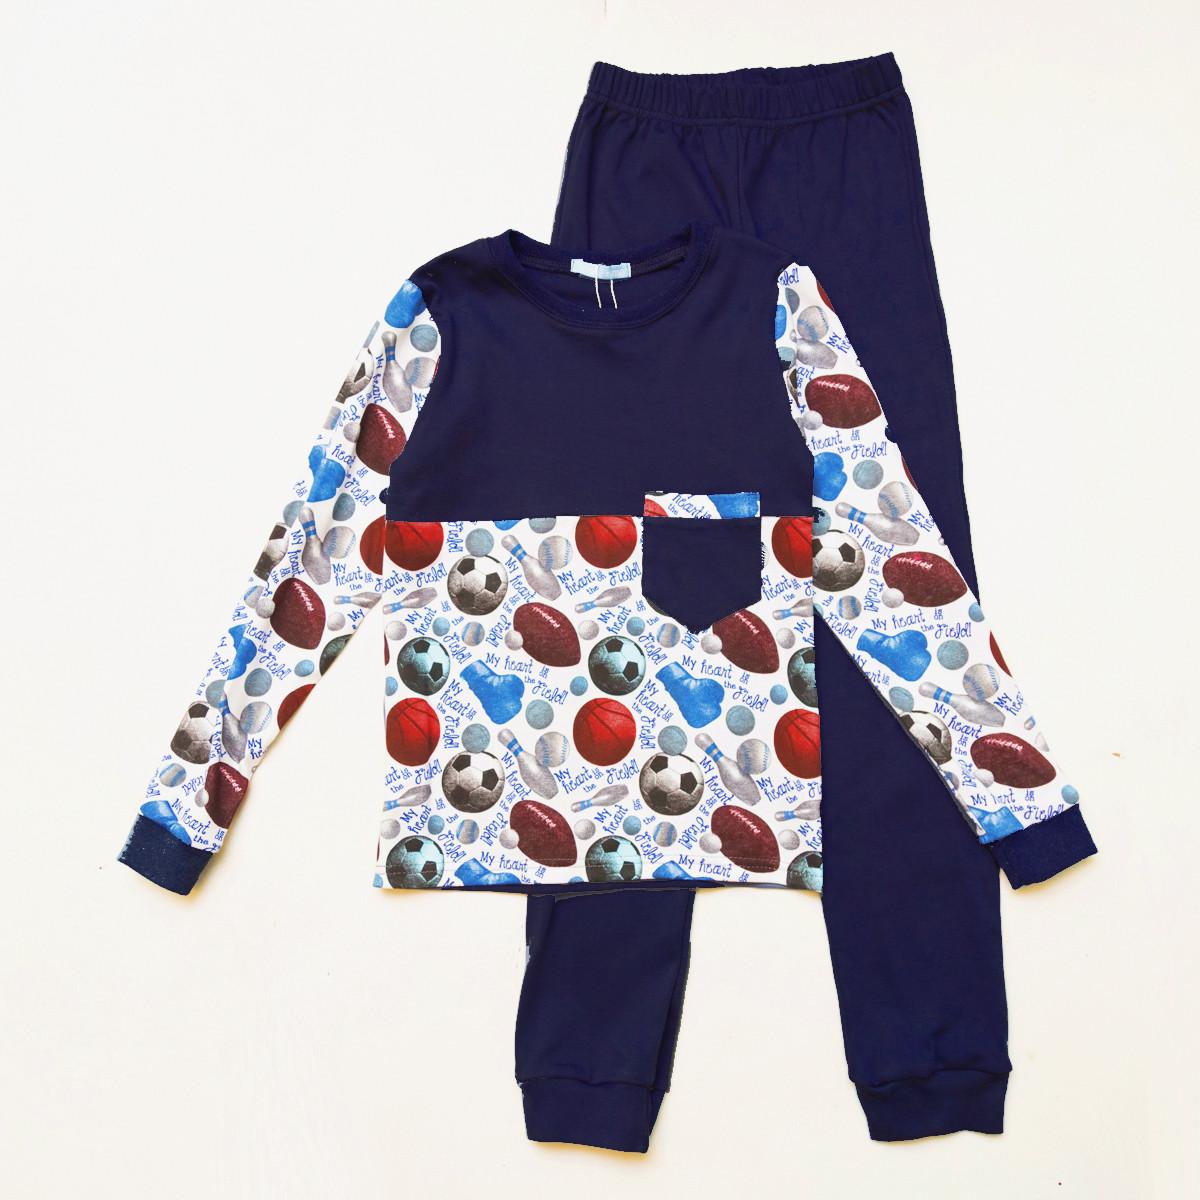 Детская пижама р.104,116,122,128 для мальчика SmileTime Sport Time, темно-синяя